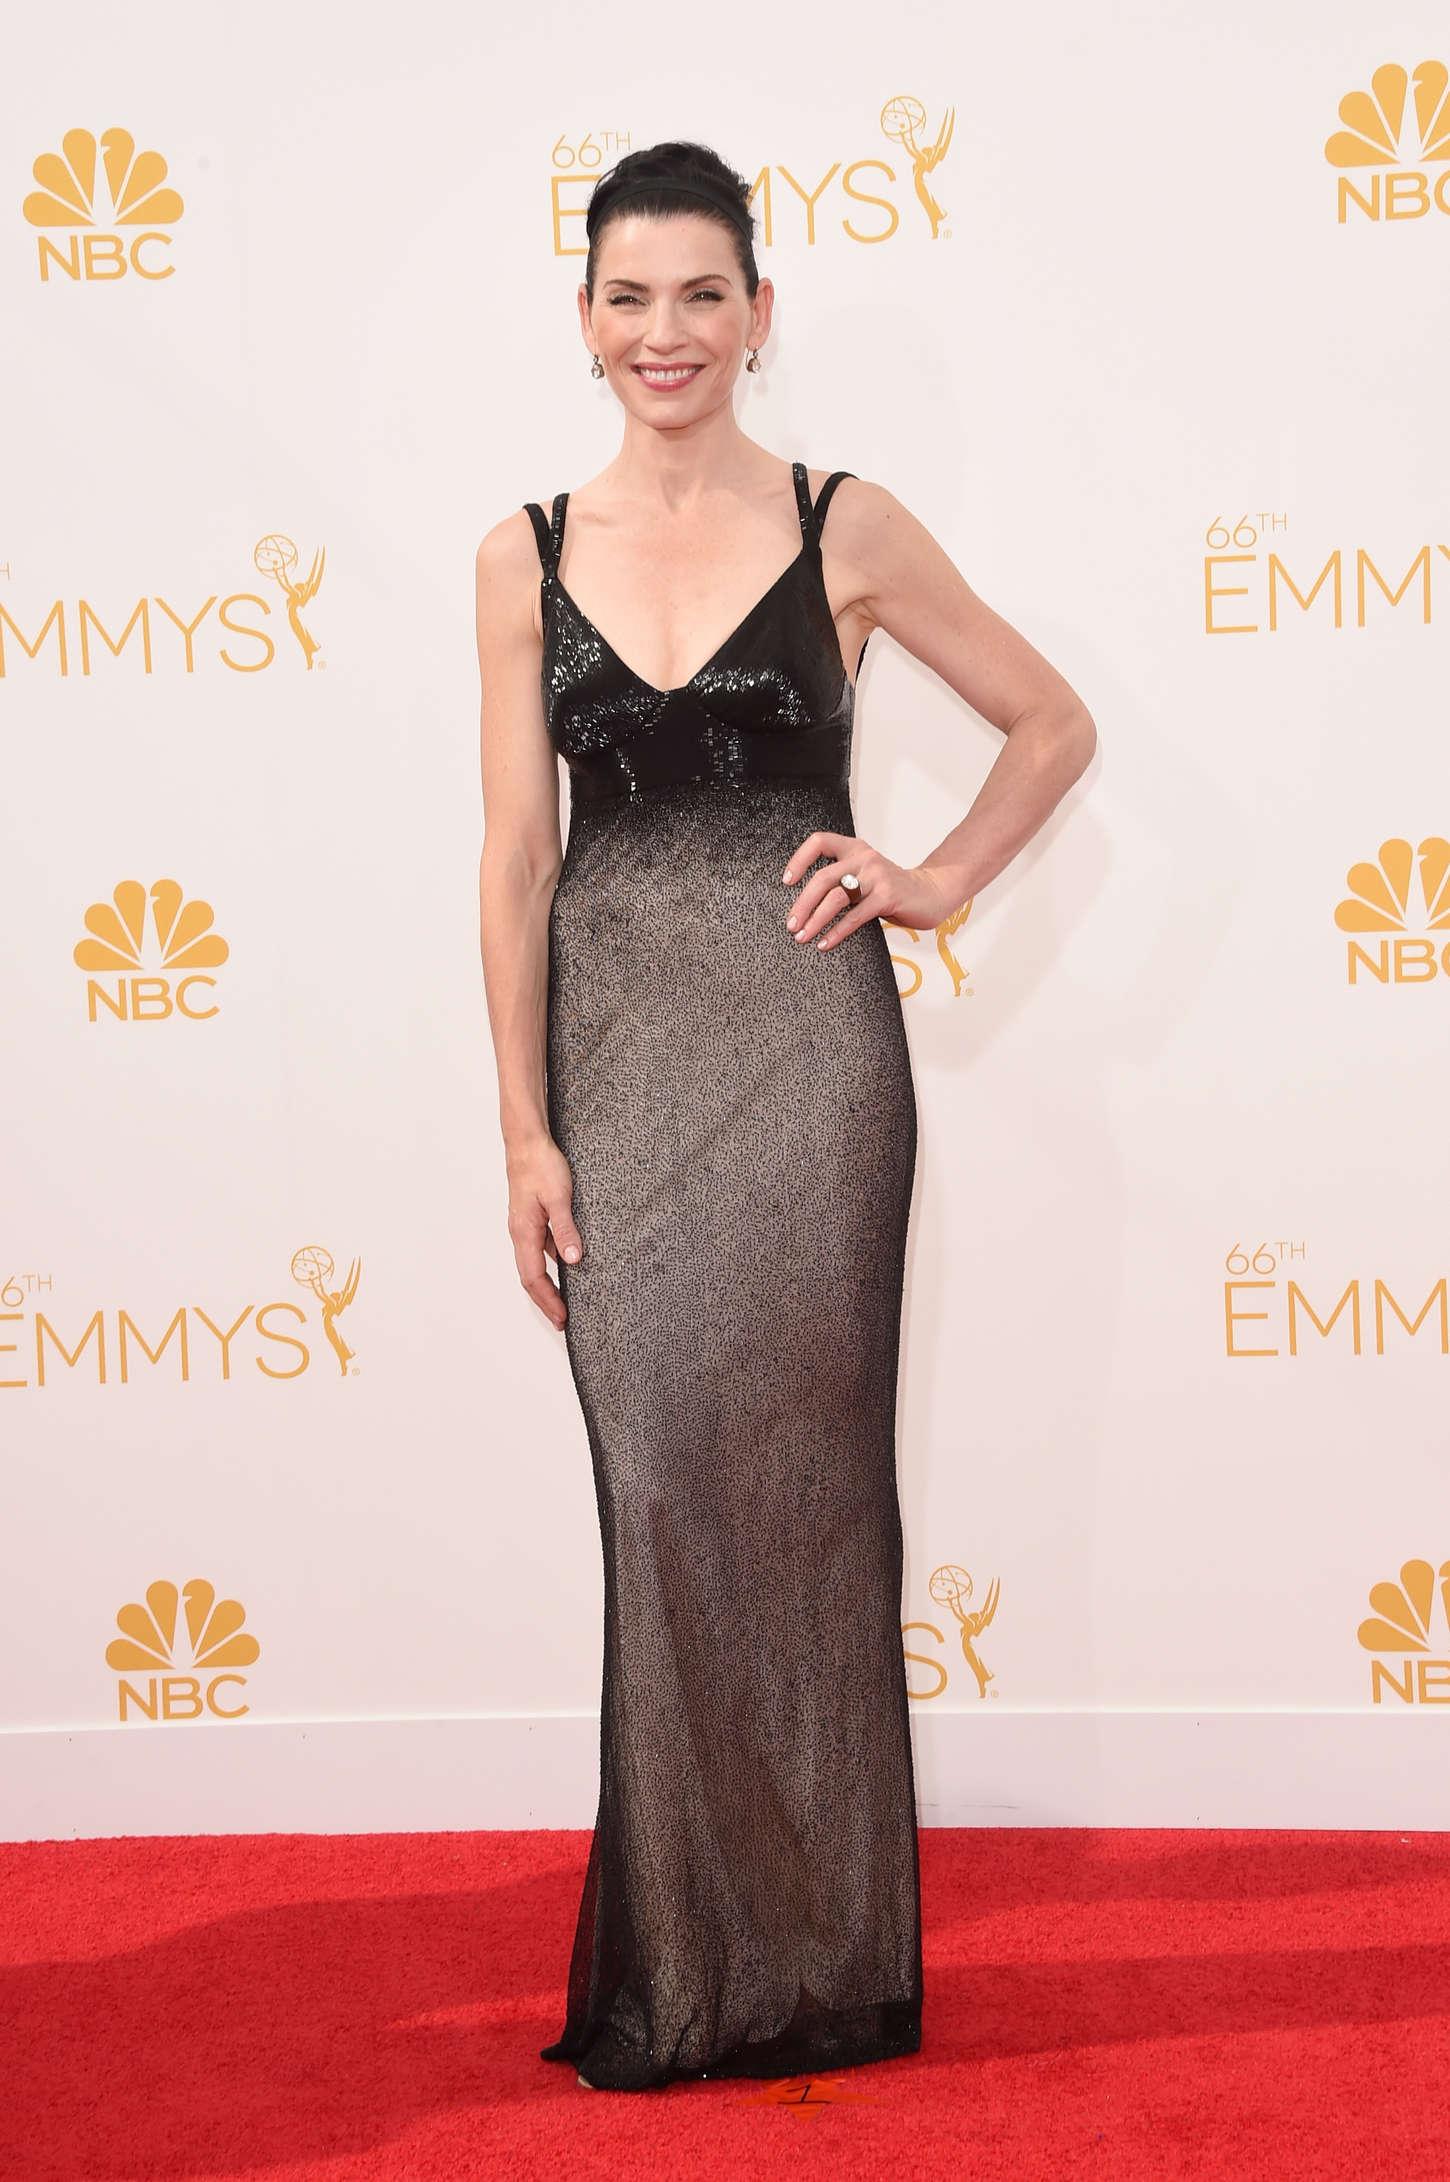 Julianna Margulies - 66th annual Primetime Emmy Awards in LA